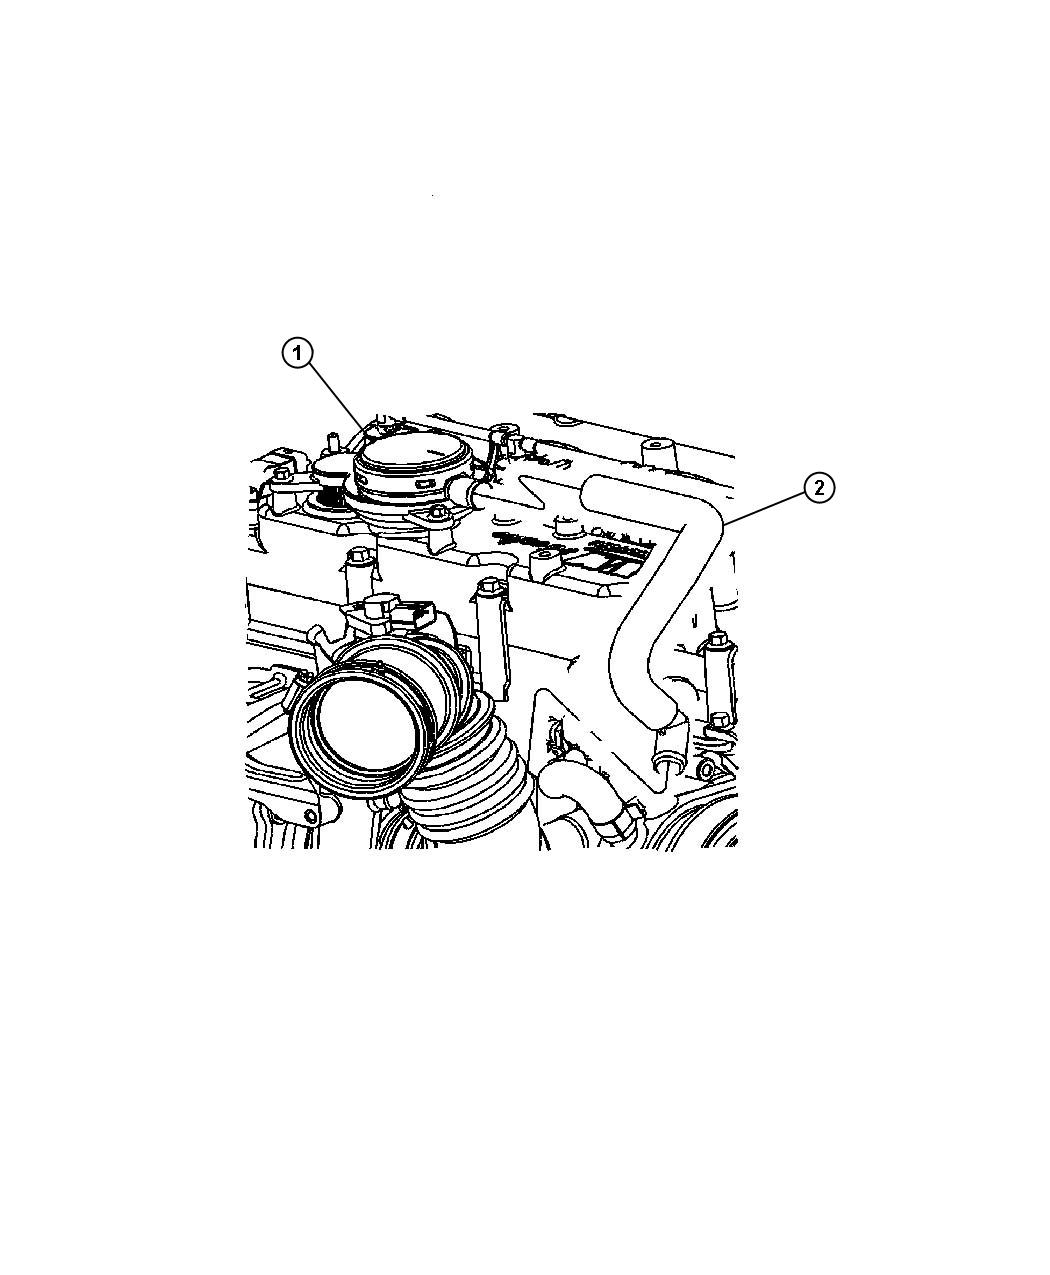 Crankcase Ventilation 2 8lsel 2 8l 4 Cyl Turbosel Engine